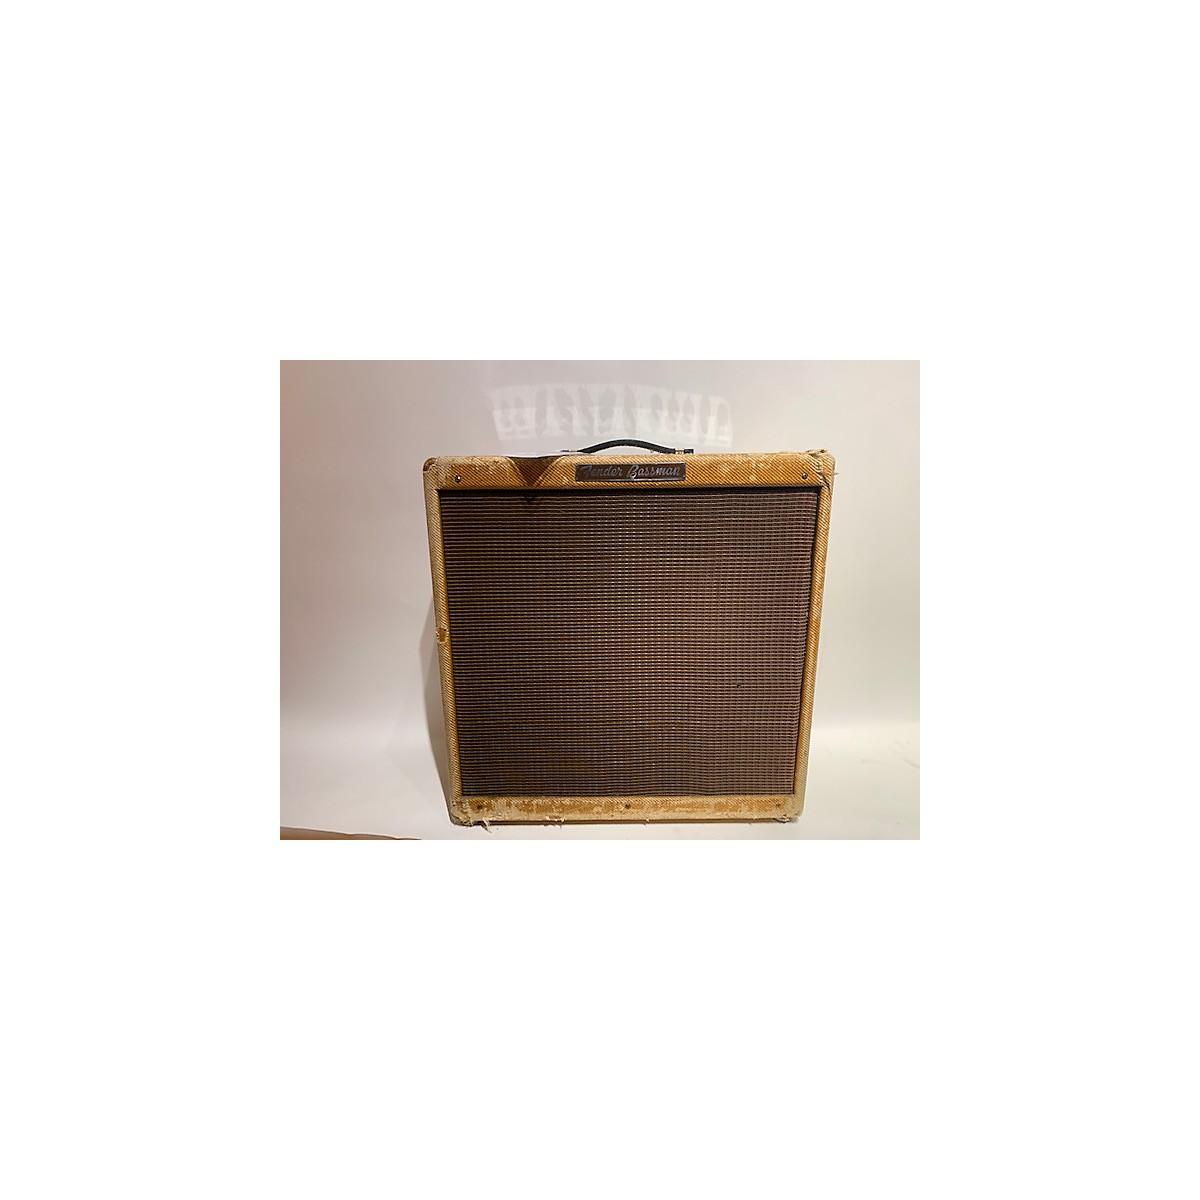 Fender 1956 Bassman Tweed Tube Guitar Combo Amp